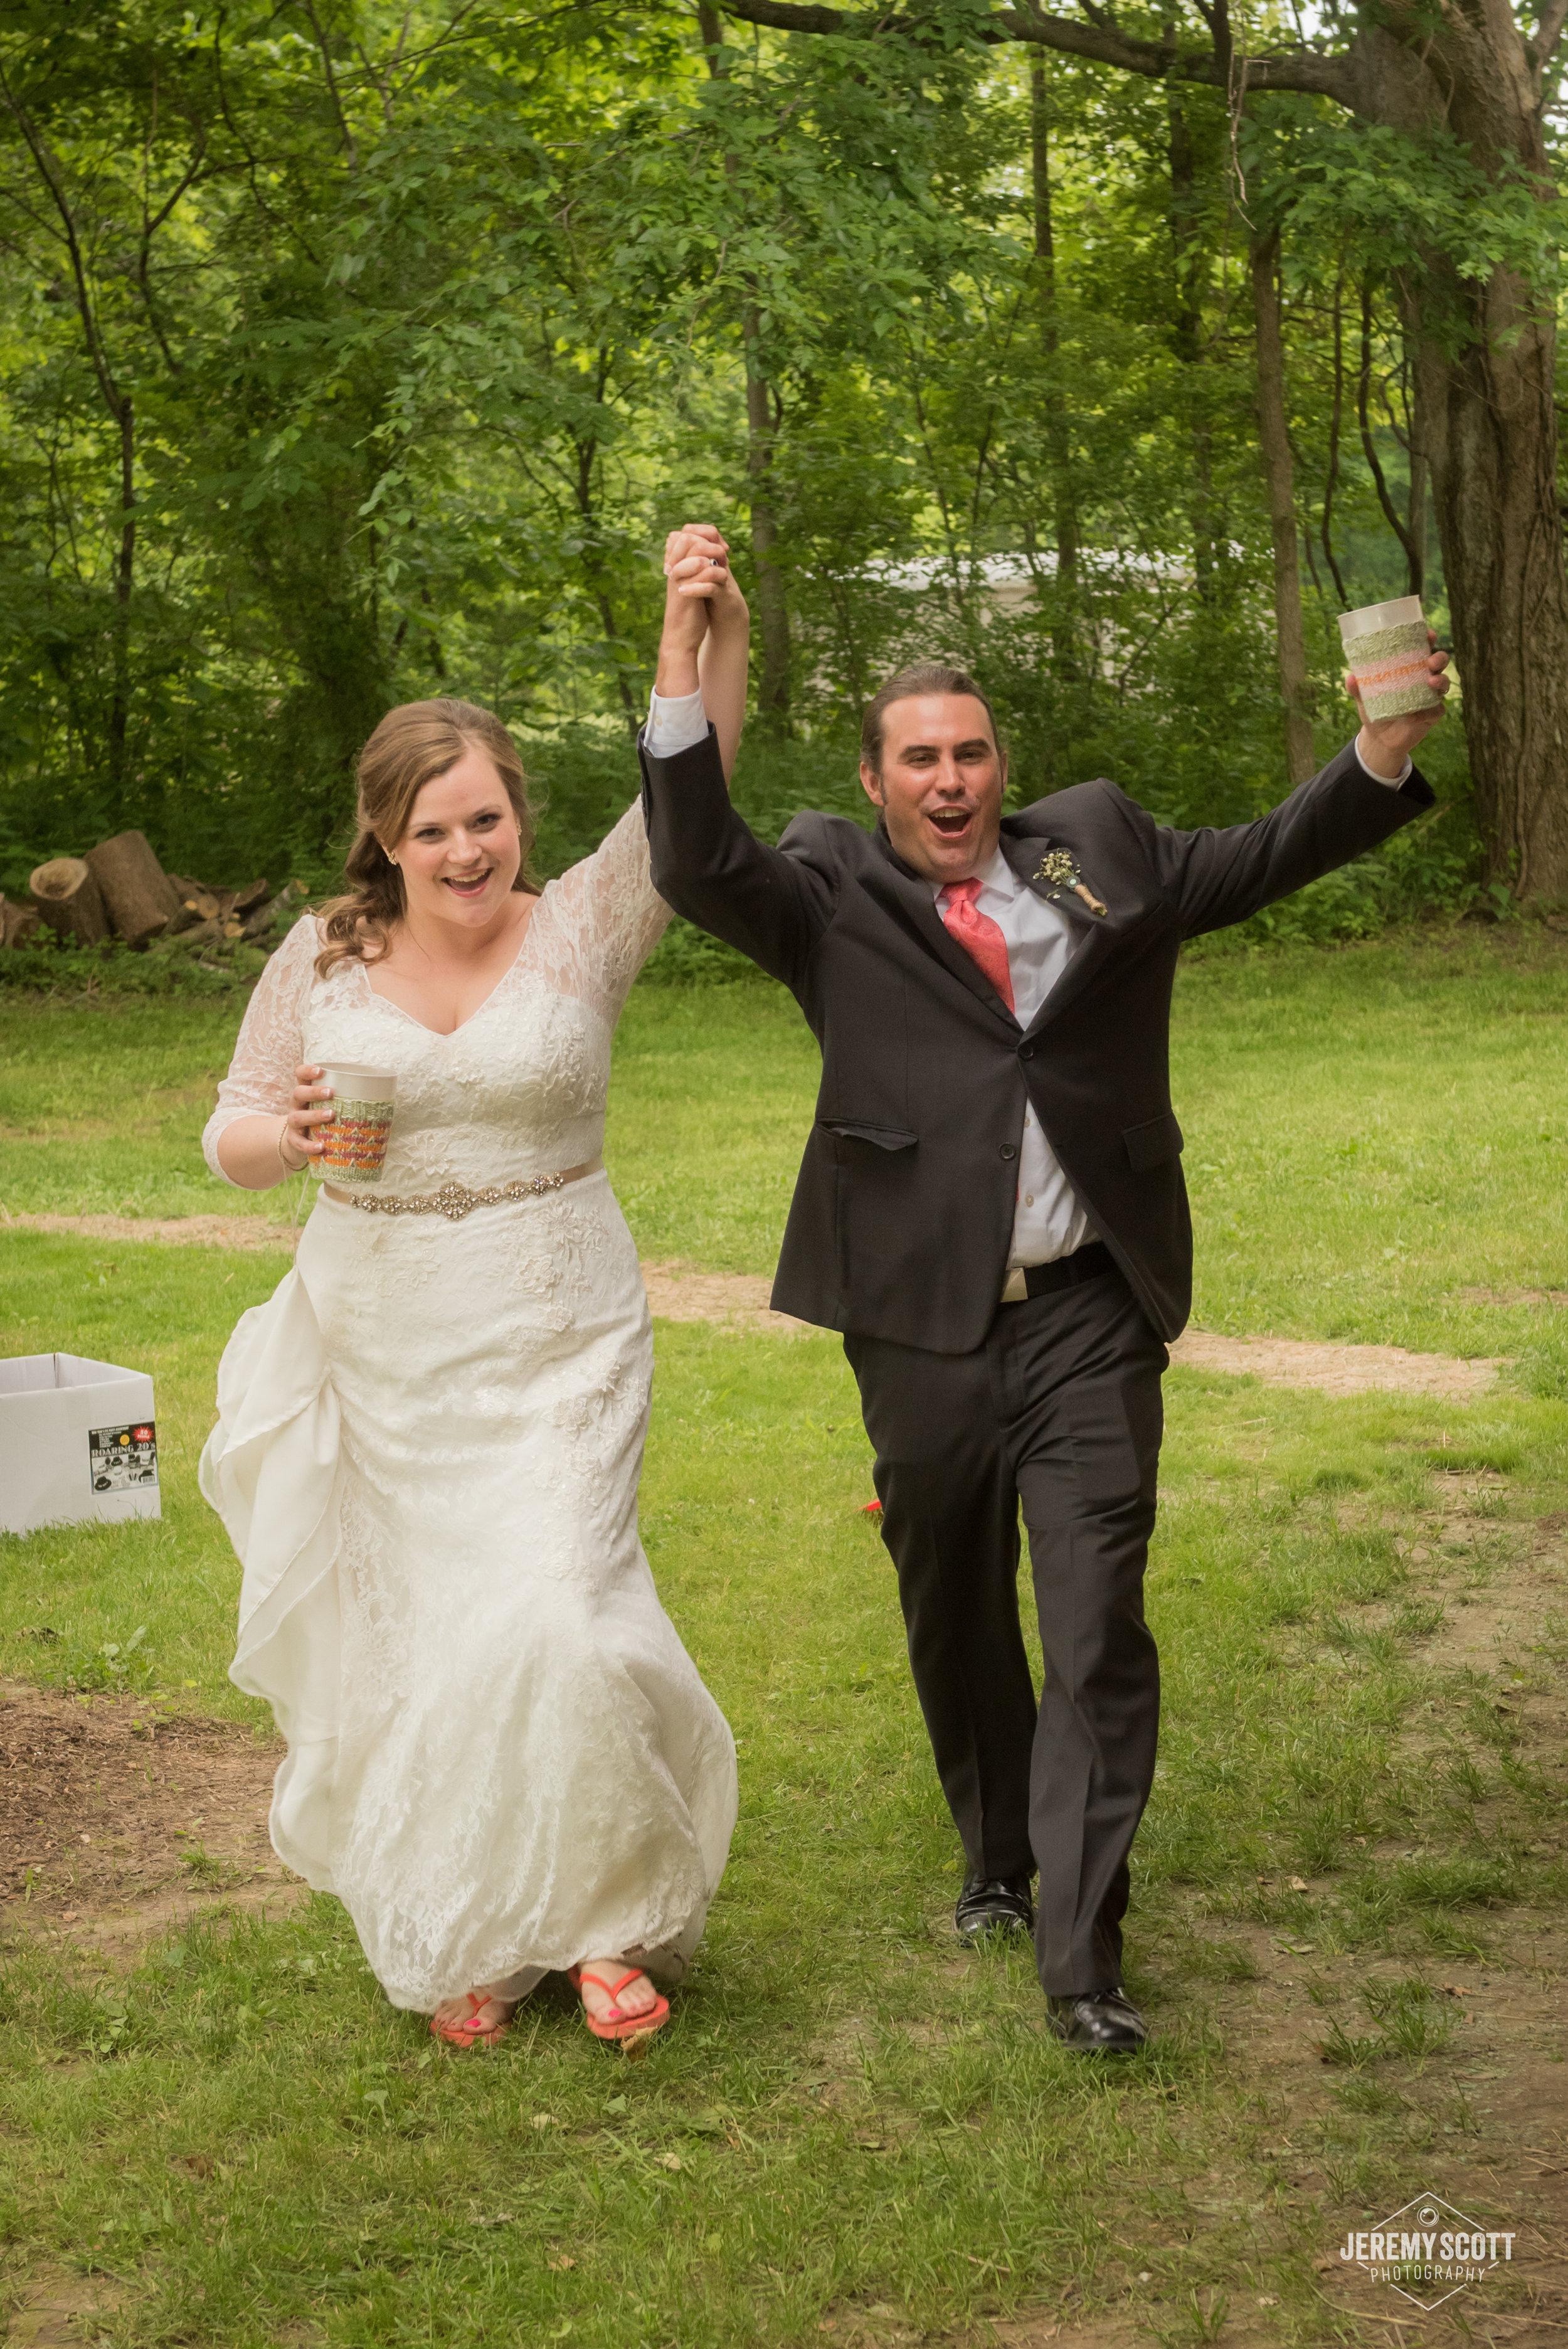 20150523_scottkristina_wedding_wm-5603-1.jpg